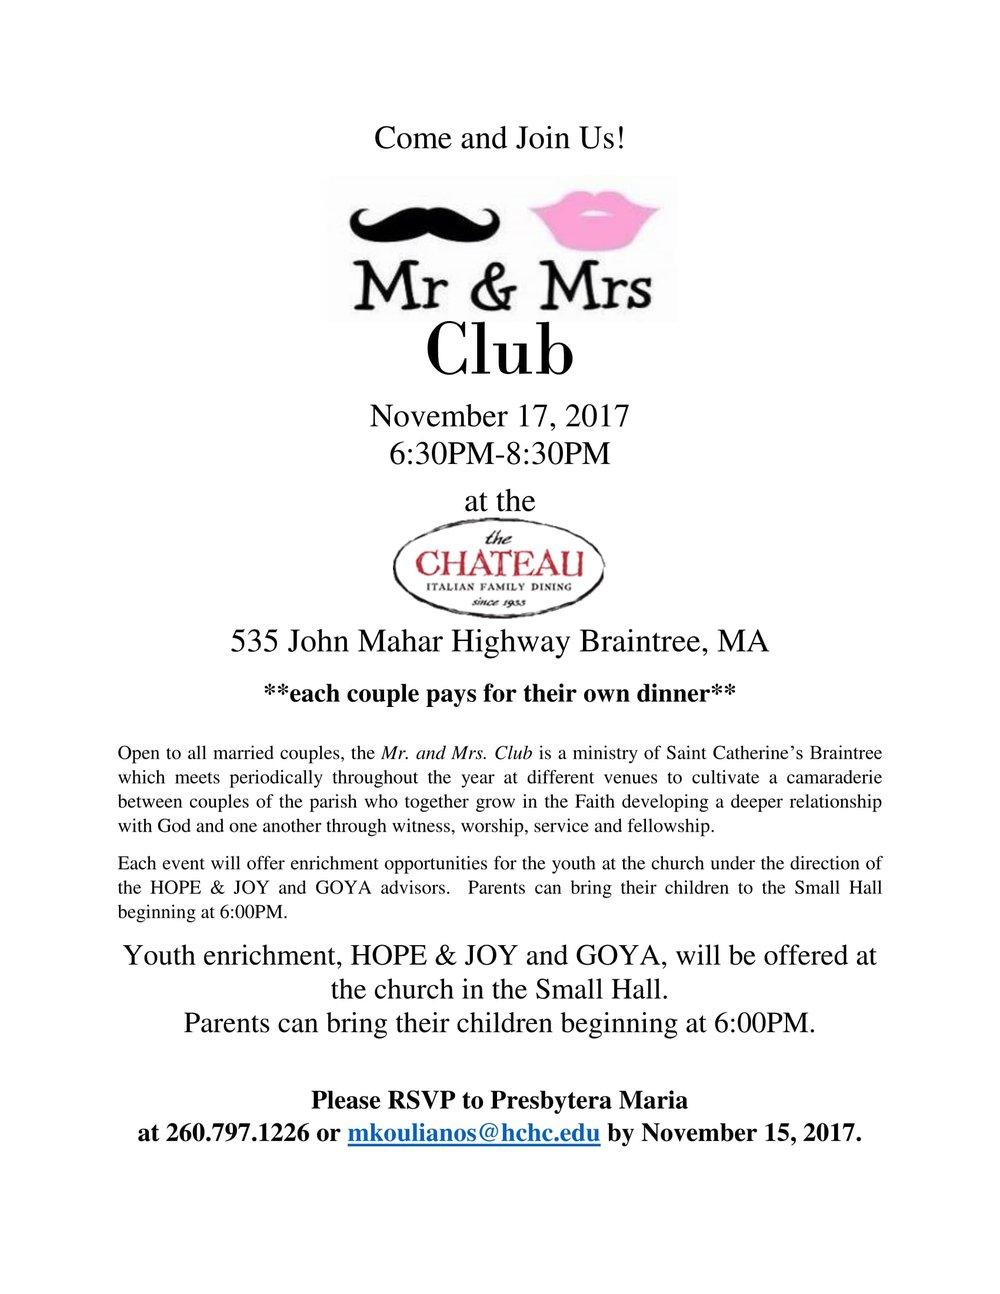 Mr and Mrs Club-1.jpg